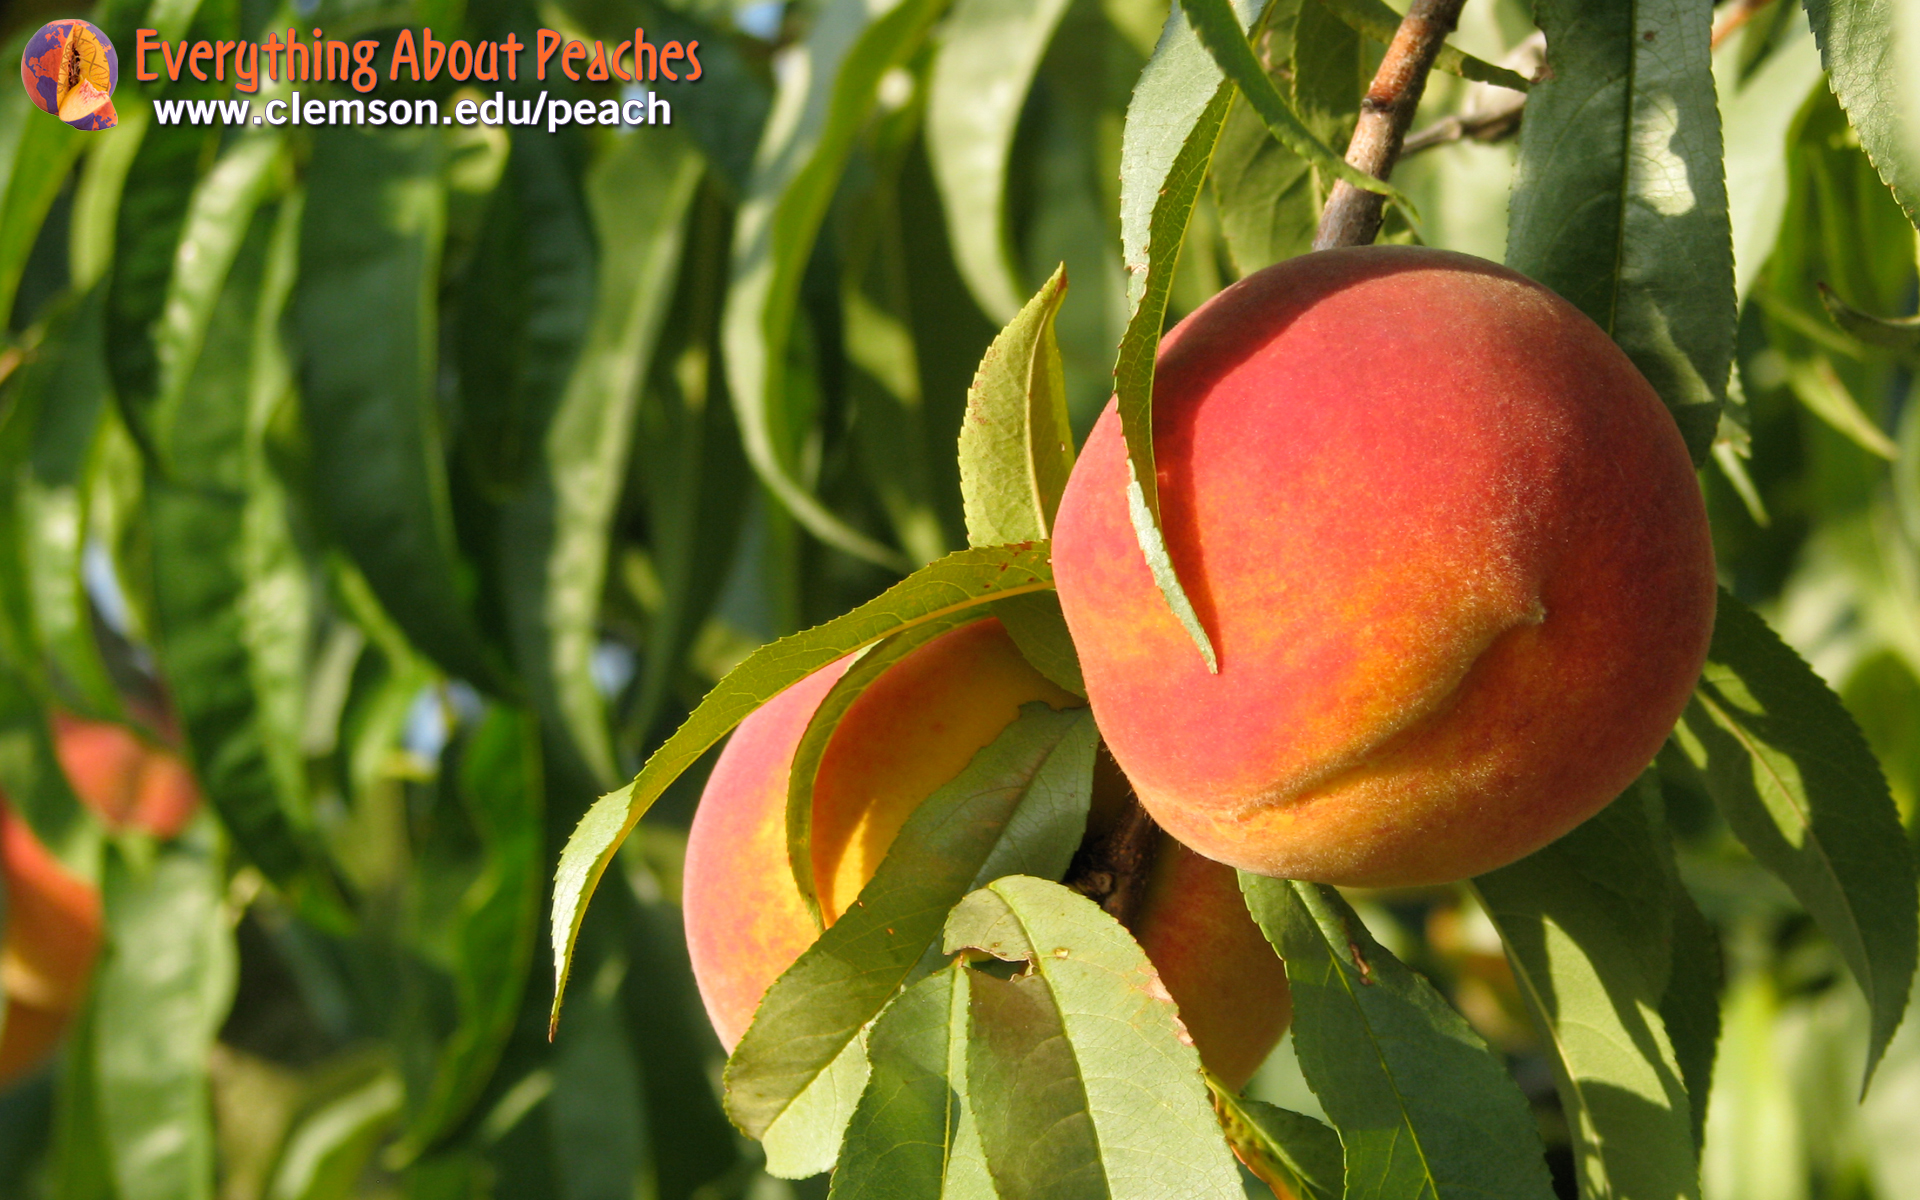 Peach tree wallpaper 166844 for The peach tree